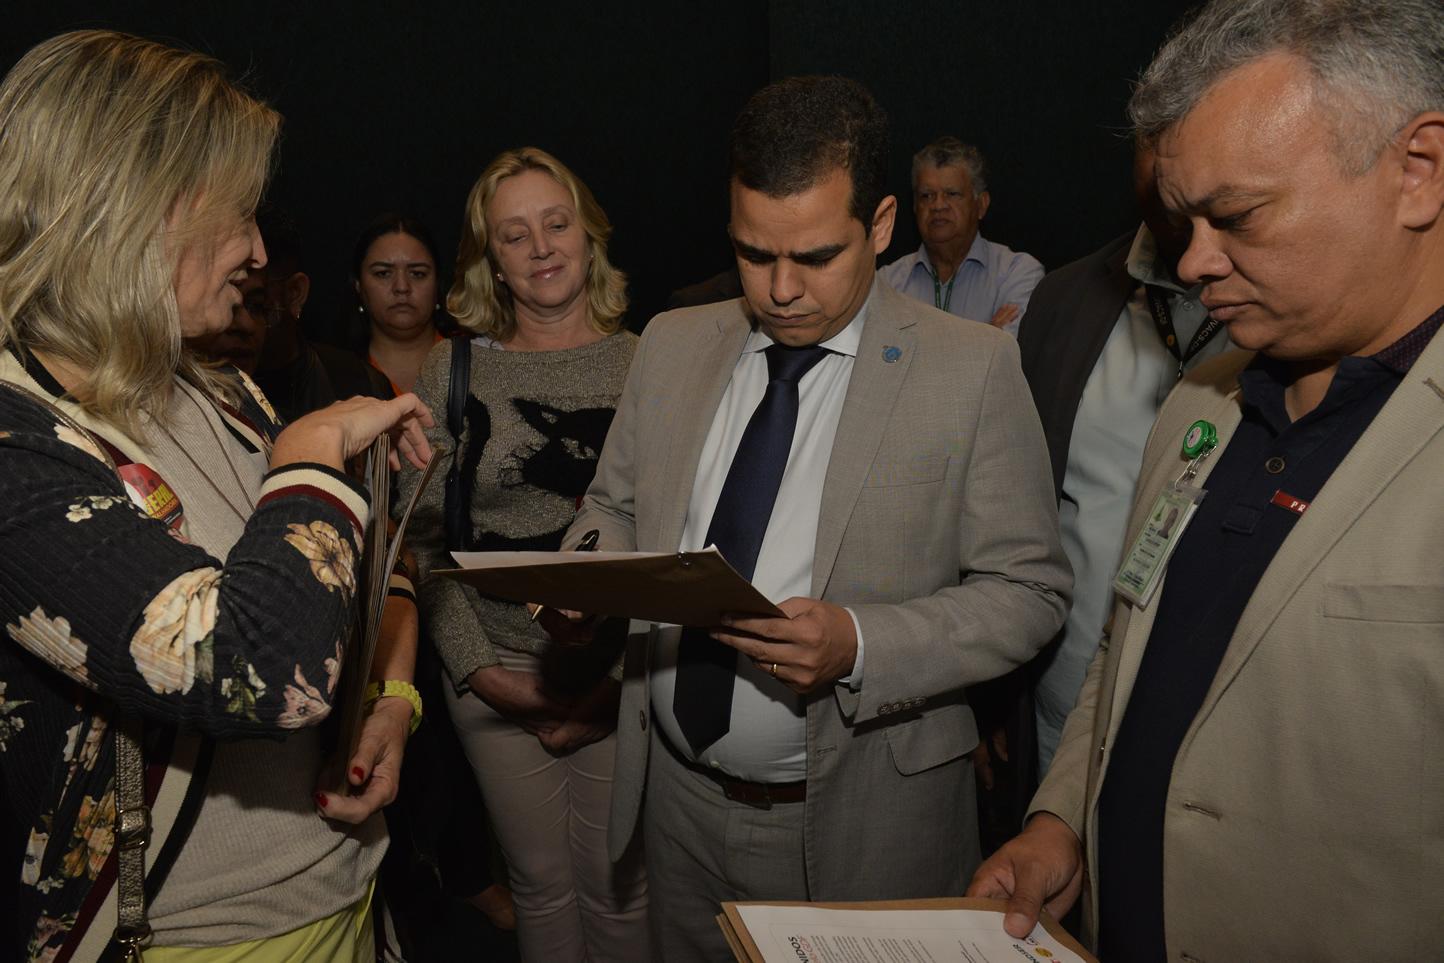 2019.06.13_Visita-aos-gabinetes-contra-o-fim-da-licenca-premio_fotos-Deva-Garcia-46